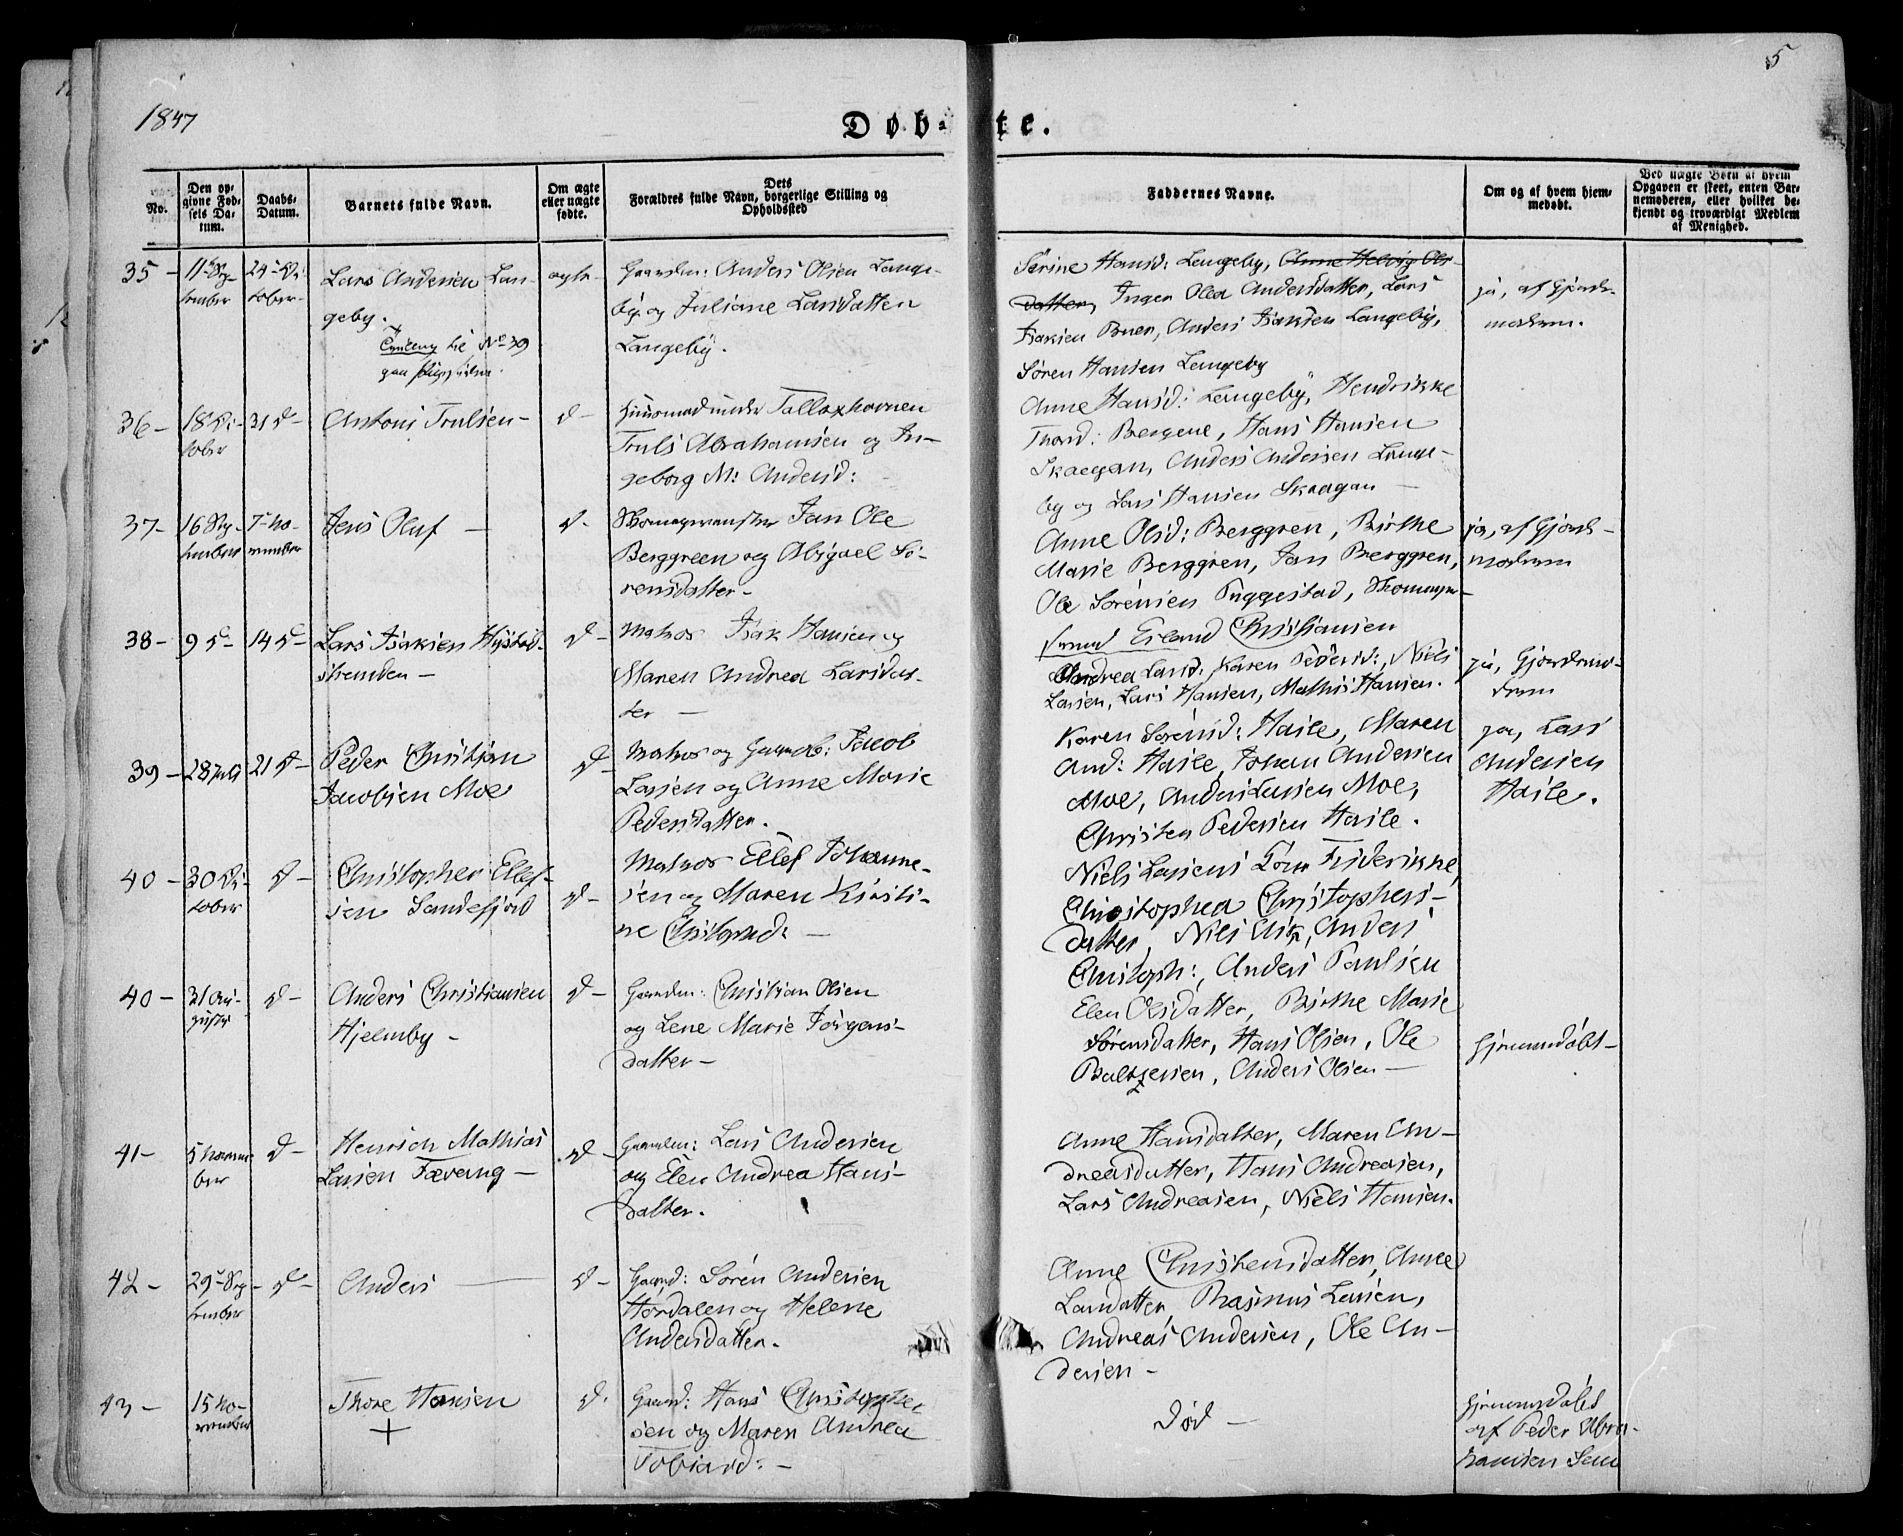 SAKO, Sandar kirkebøker, F/Fa/L0006: Parish register (official) no. 6, 1847-1860, p. 5a